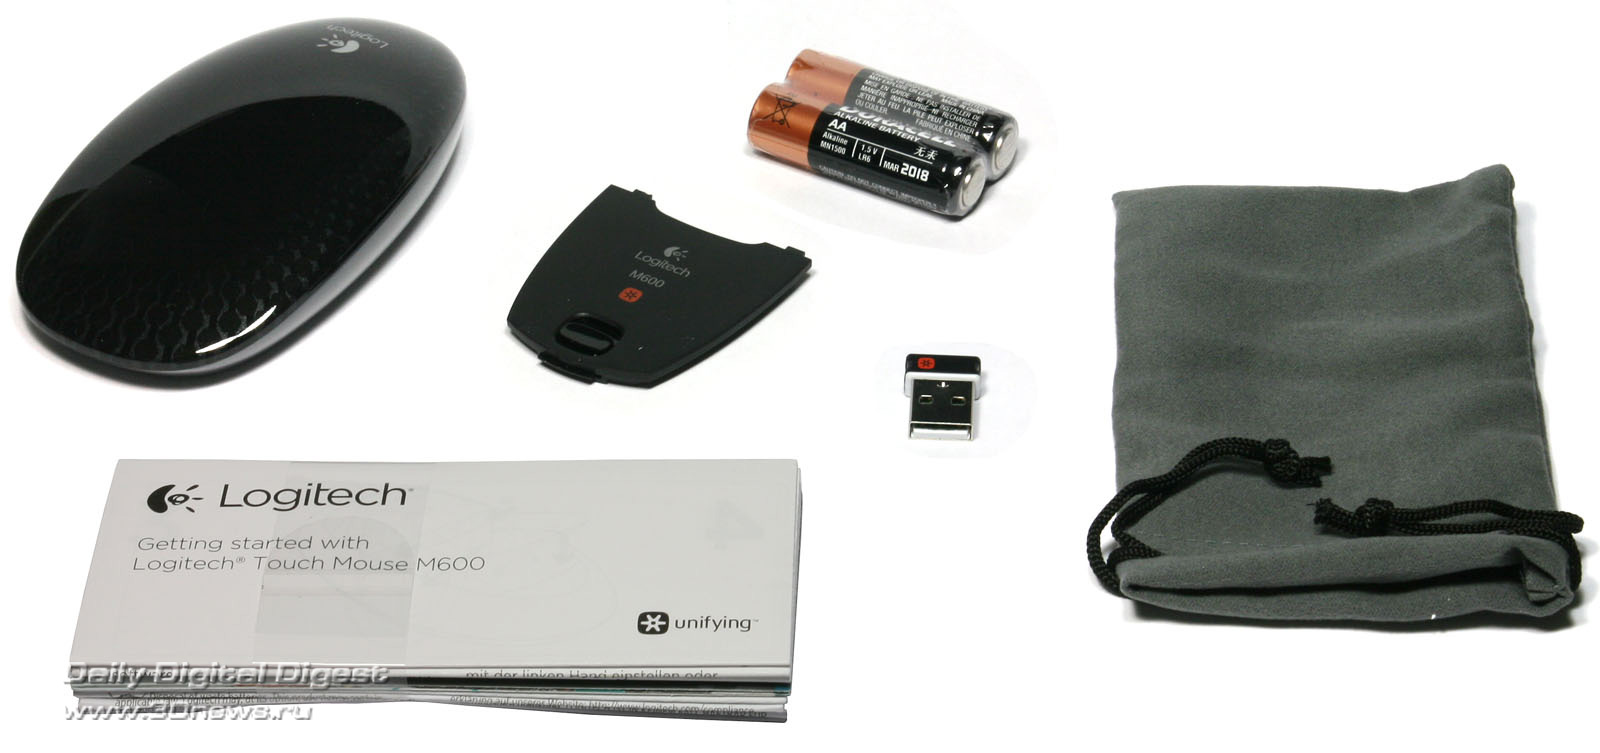 Купить Arduino модули и датчики Ардуино дёшево